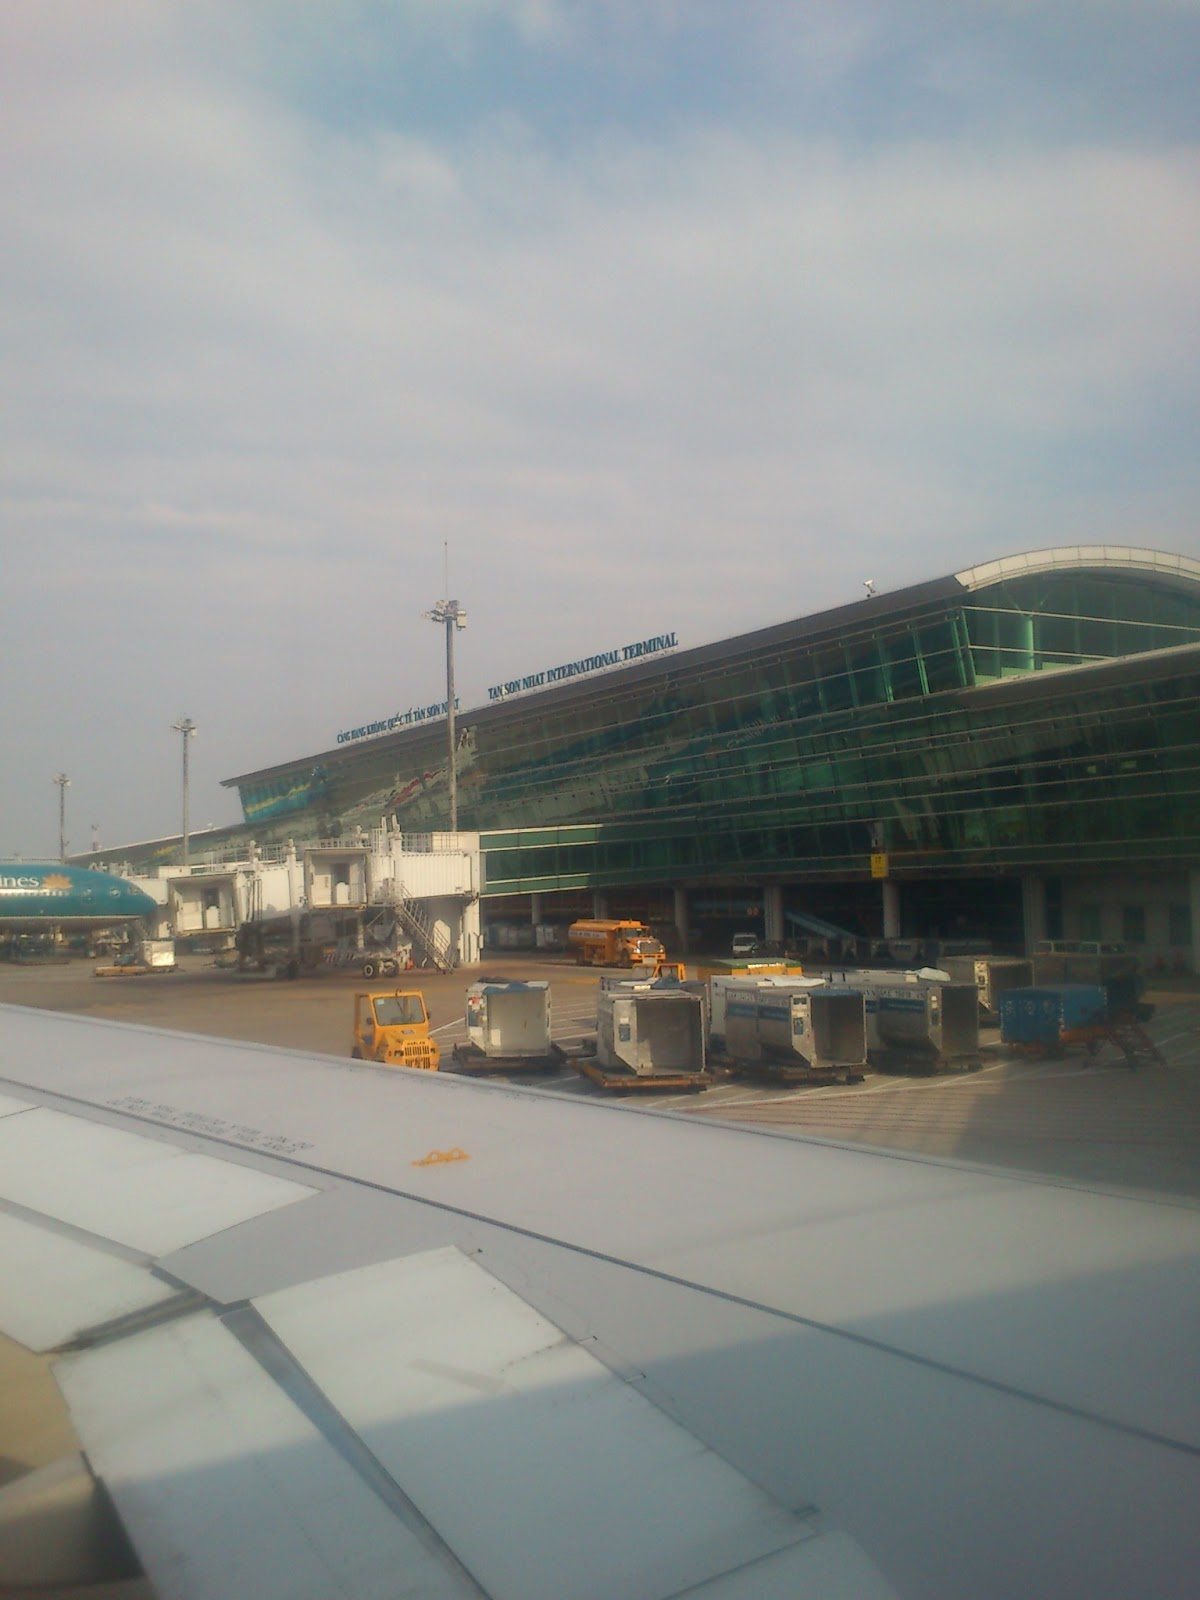 Ho Chi Minh International Airport